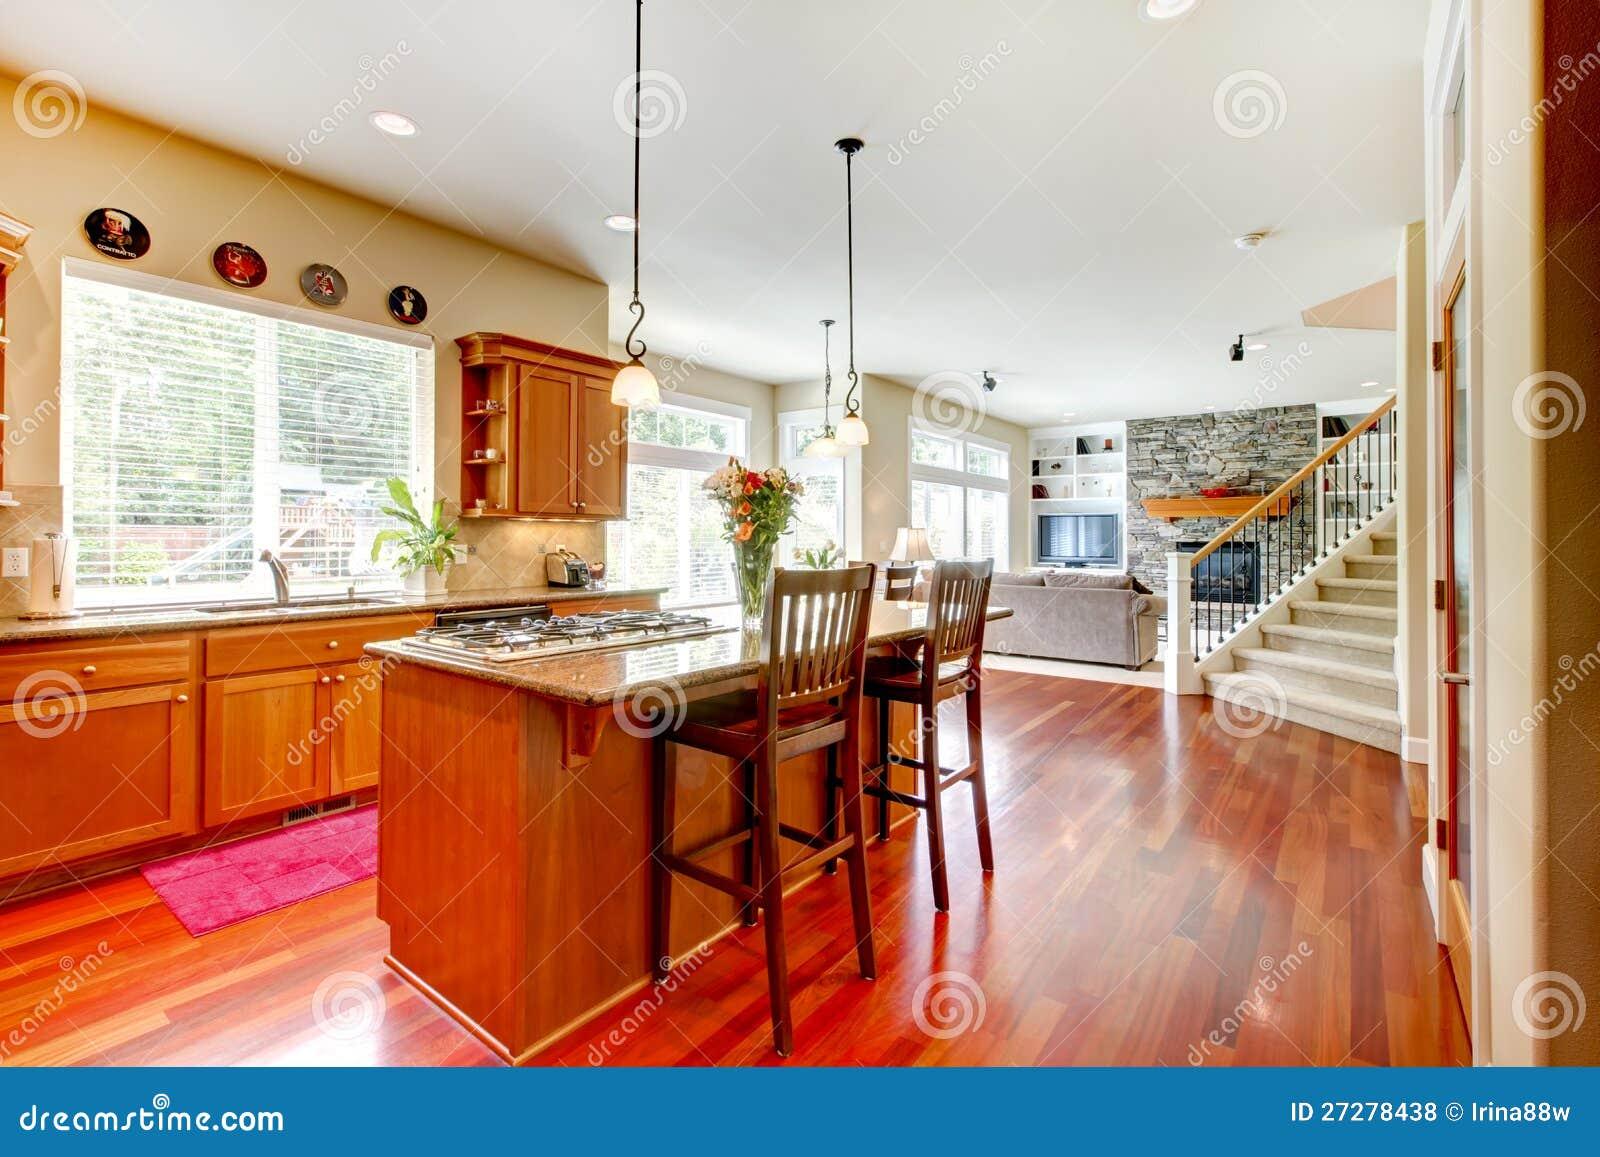 Wood lyxigt stort kök, vardagsrum royaltyfria foton   bild: 27278438